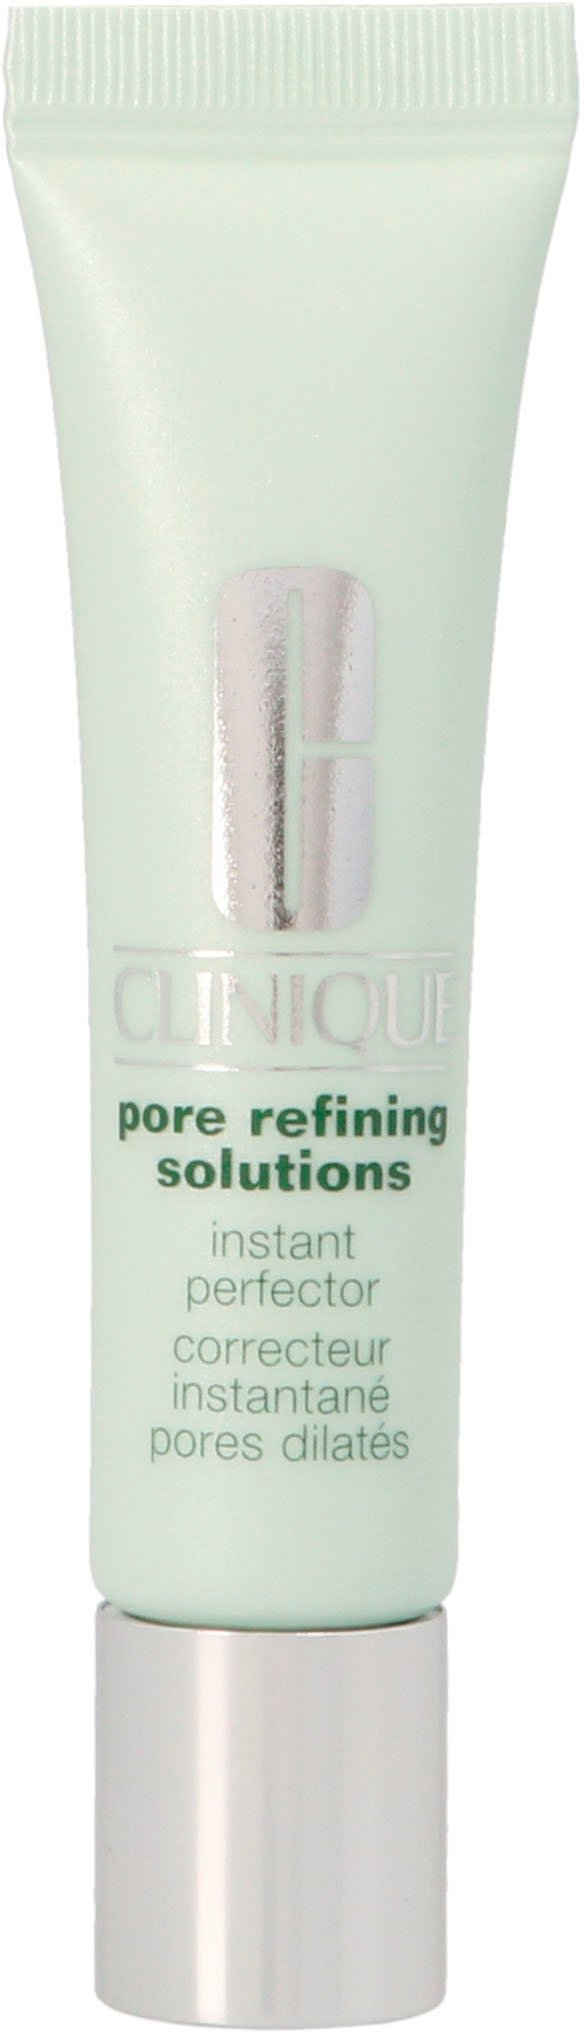 CLINIQUE Getönte Gesichtscreme »Pore Refining Solutions Instant Perfector«